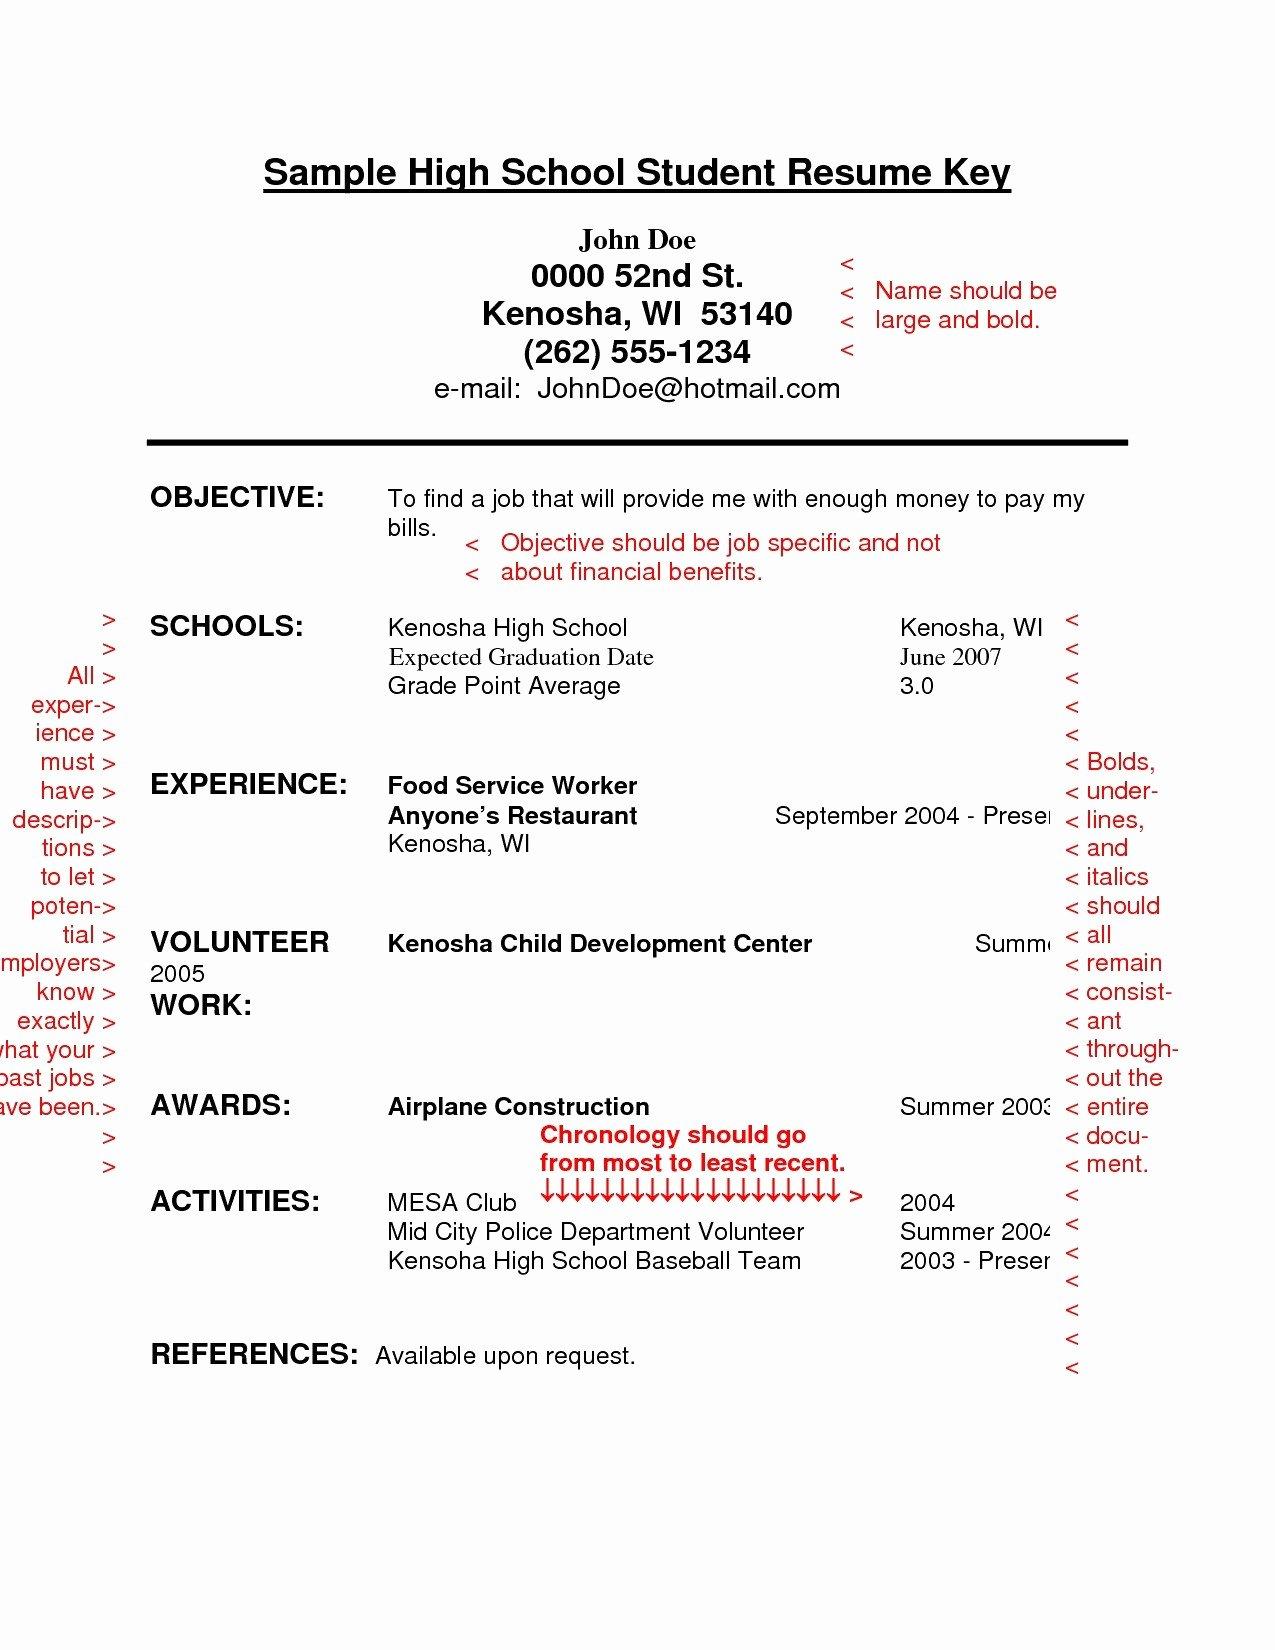 Sample Resume for Recent High School Graduate List